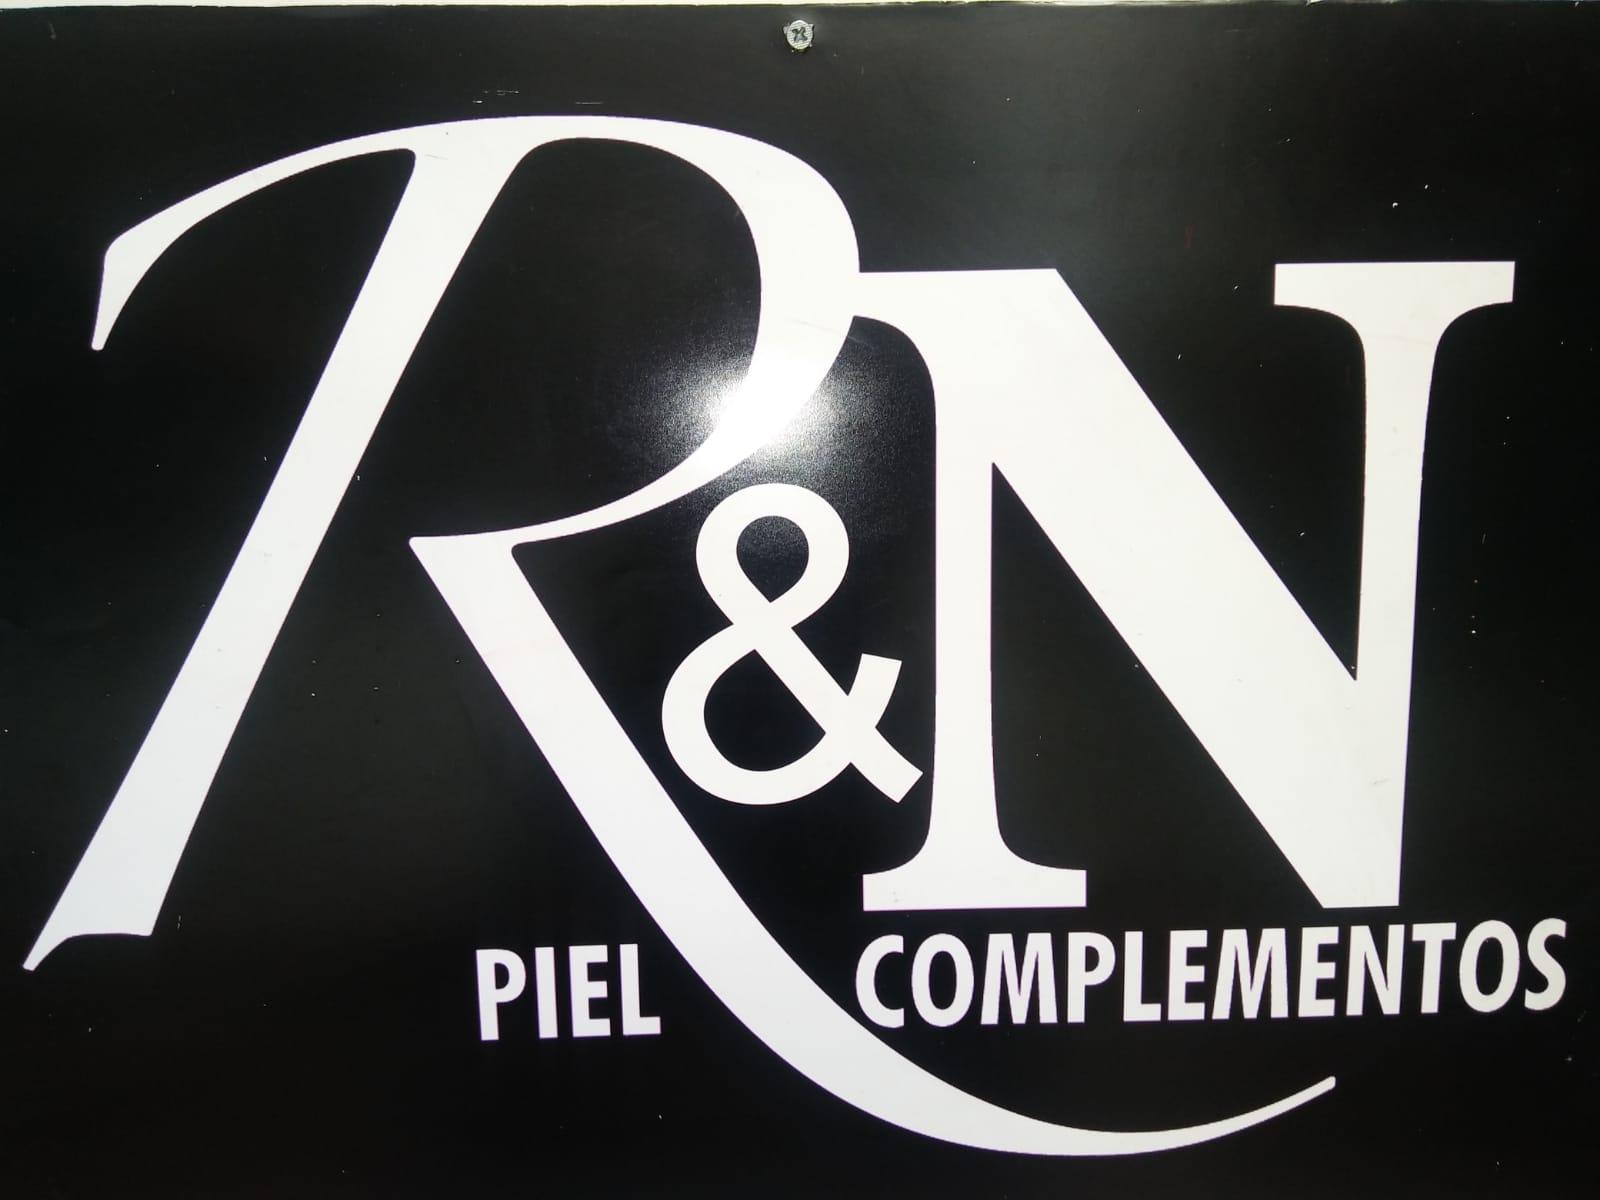 R N complementos y bolsos stand  f64591e8a30f